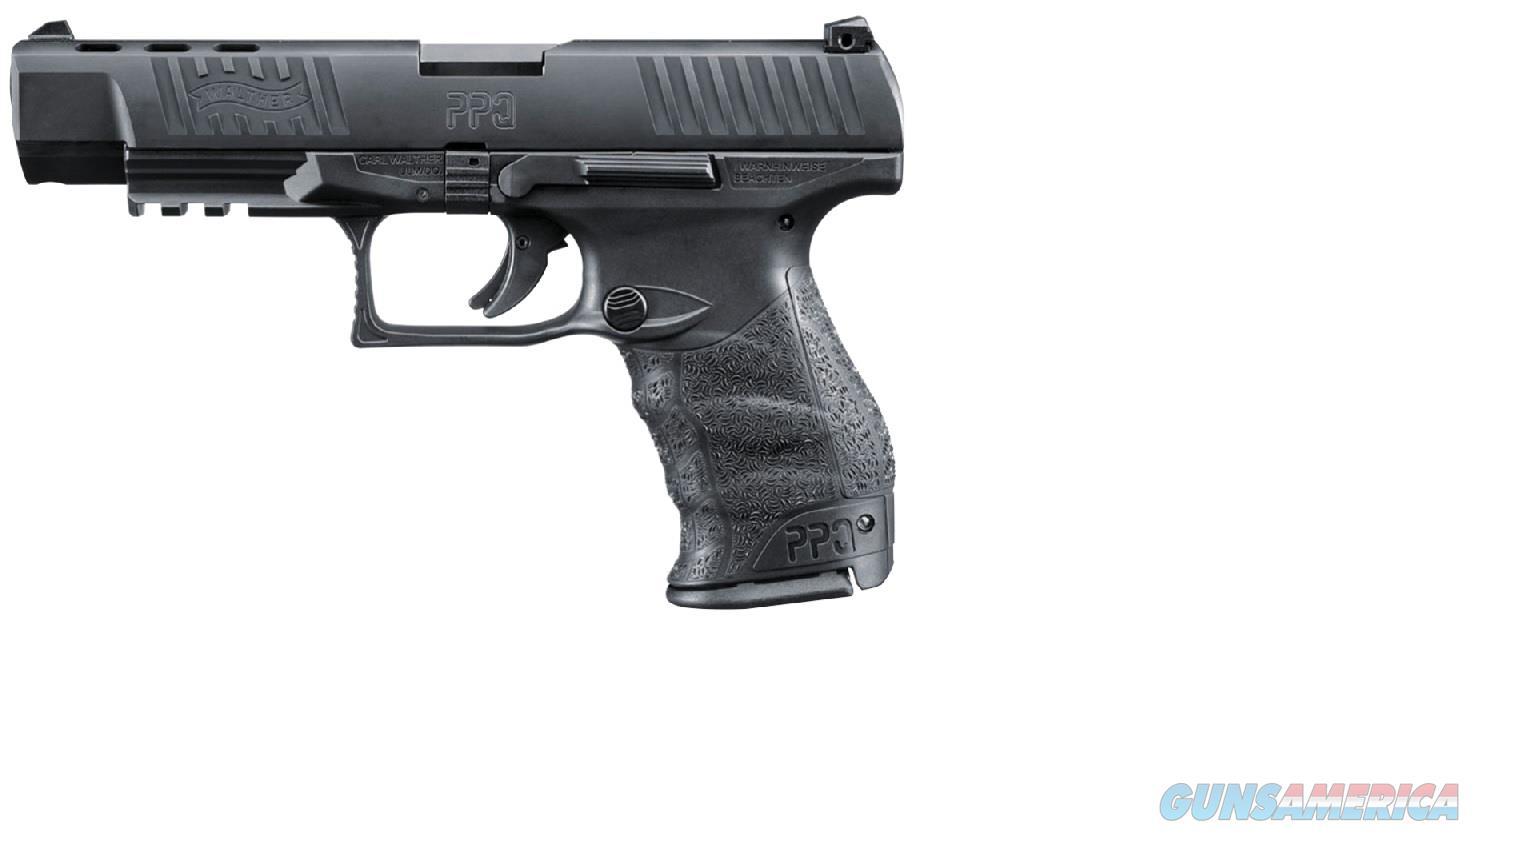 "2796092 Walther PPQ M2 - 5""  9mm  Guns > Pistols > Walther Pistols > Post WWII > P99/PPQ"